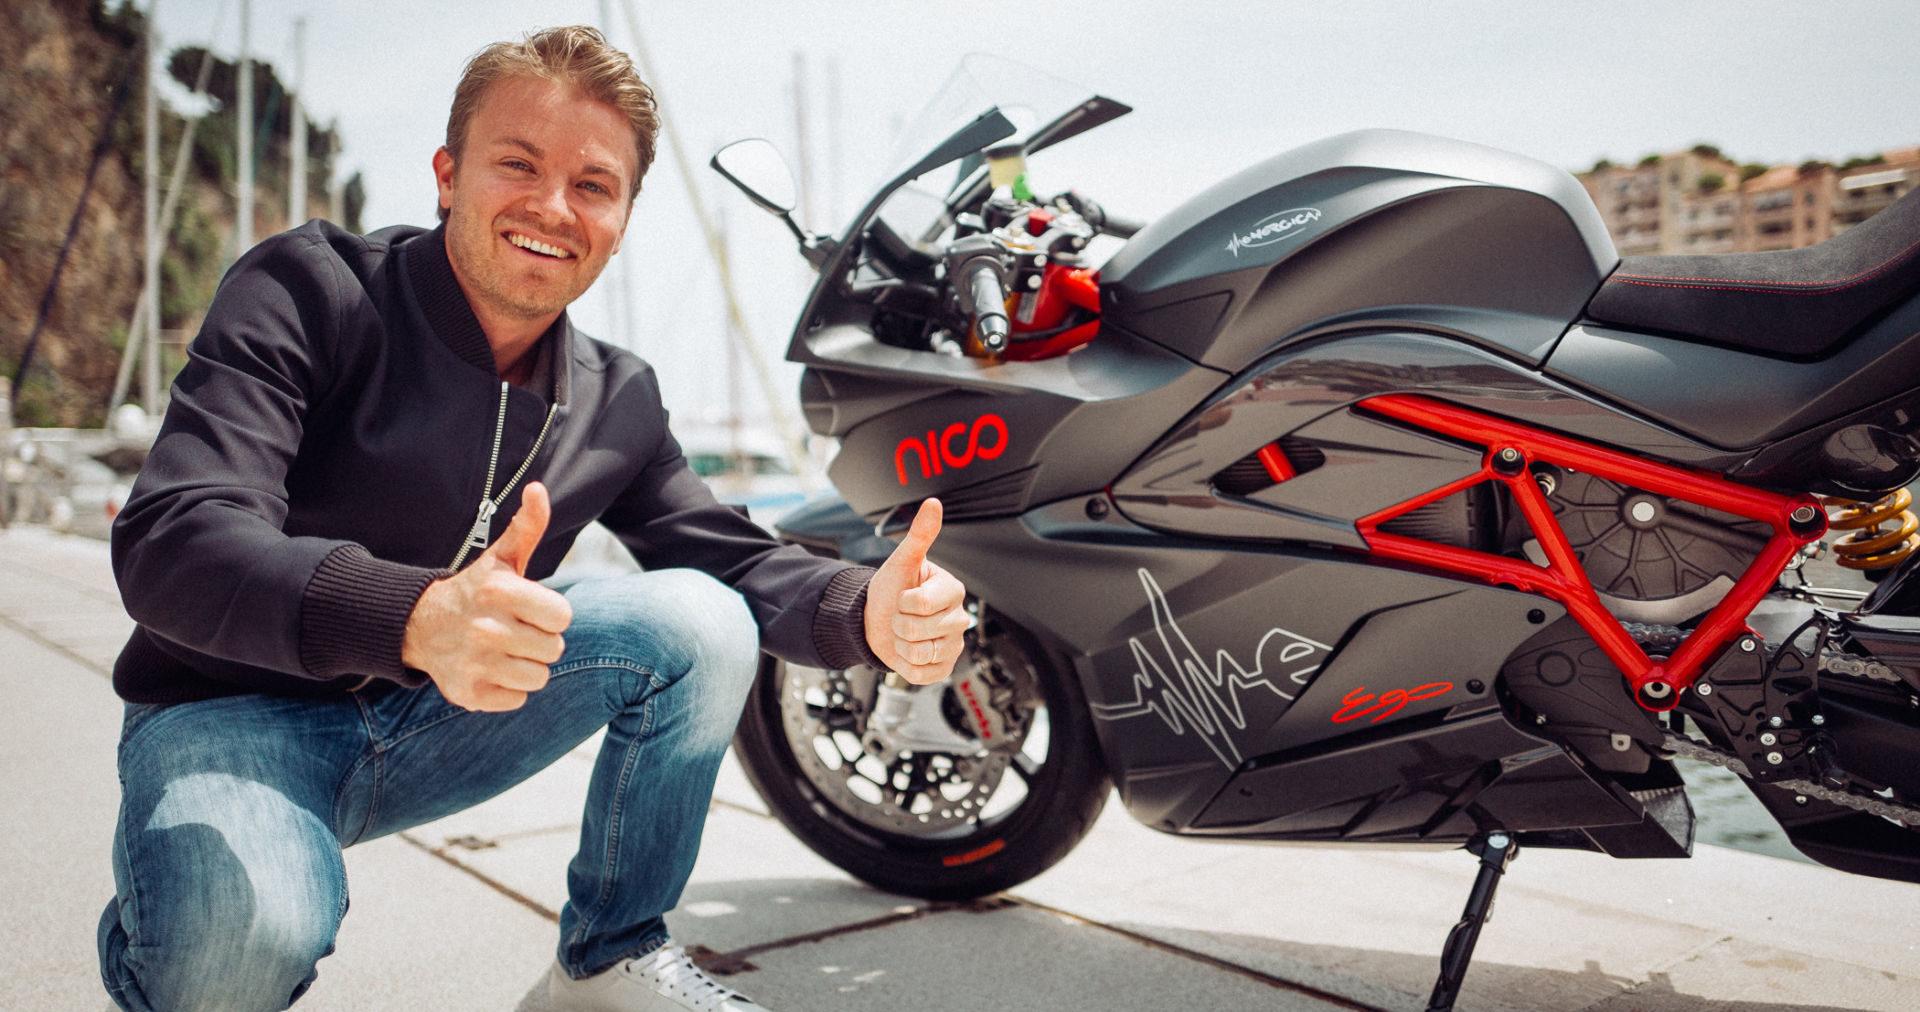 Nico Rosberg and his Energica Ego electric sportbike. Photo courtesy Energica.